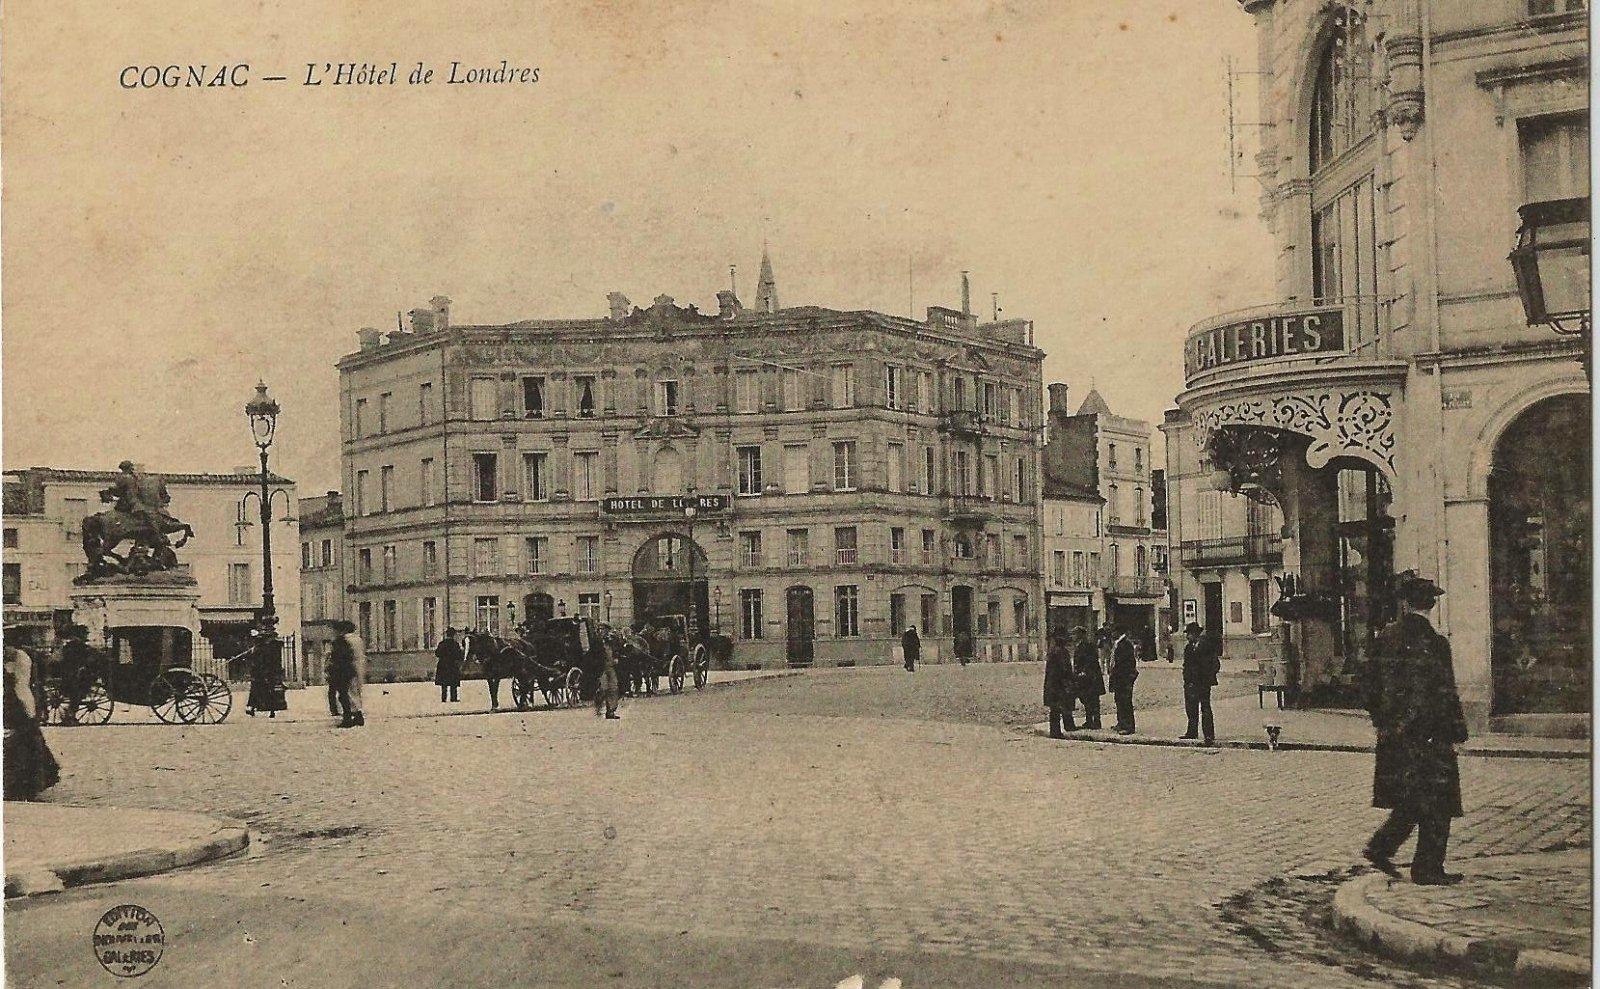 Cognac hotel de londres 1915 cartes postales cartes for Hotels londres